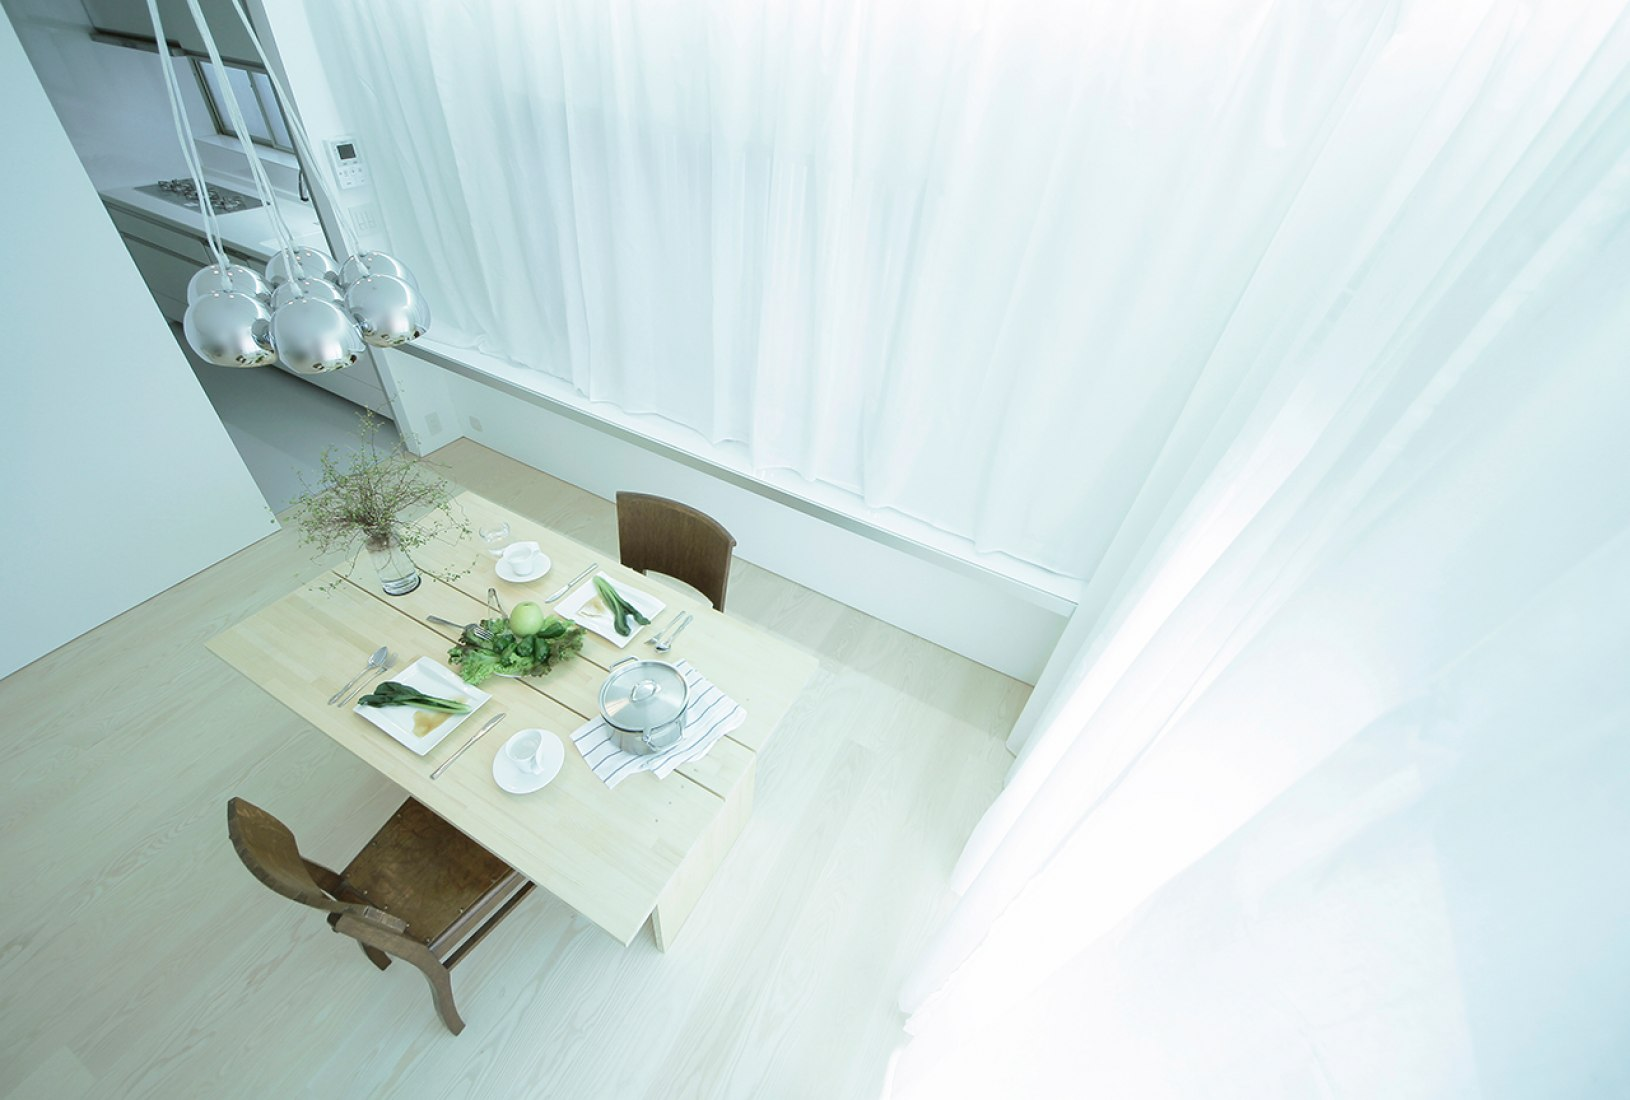 Casa en Kiyosu. Fotografía © Jun Murata / JAM.